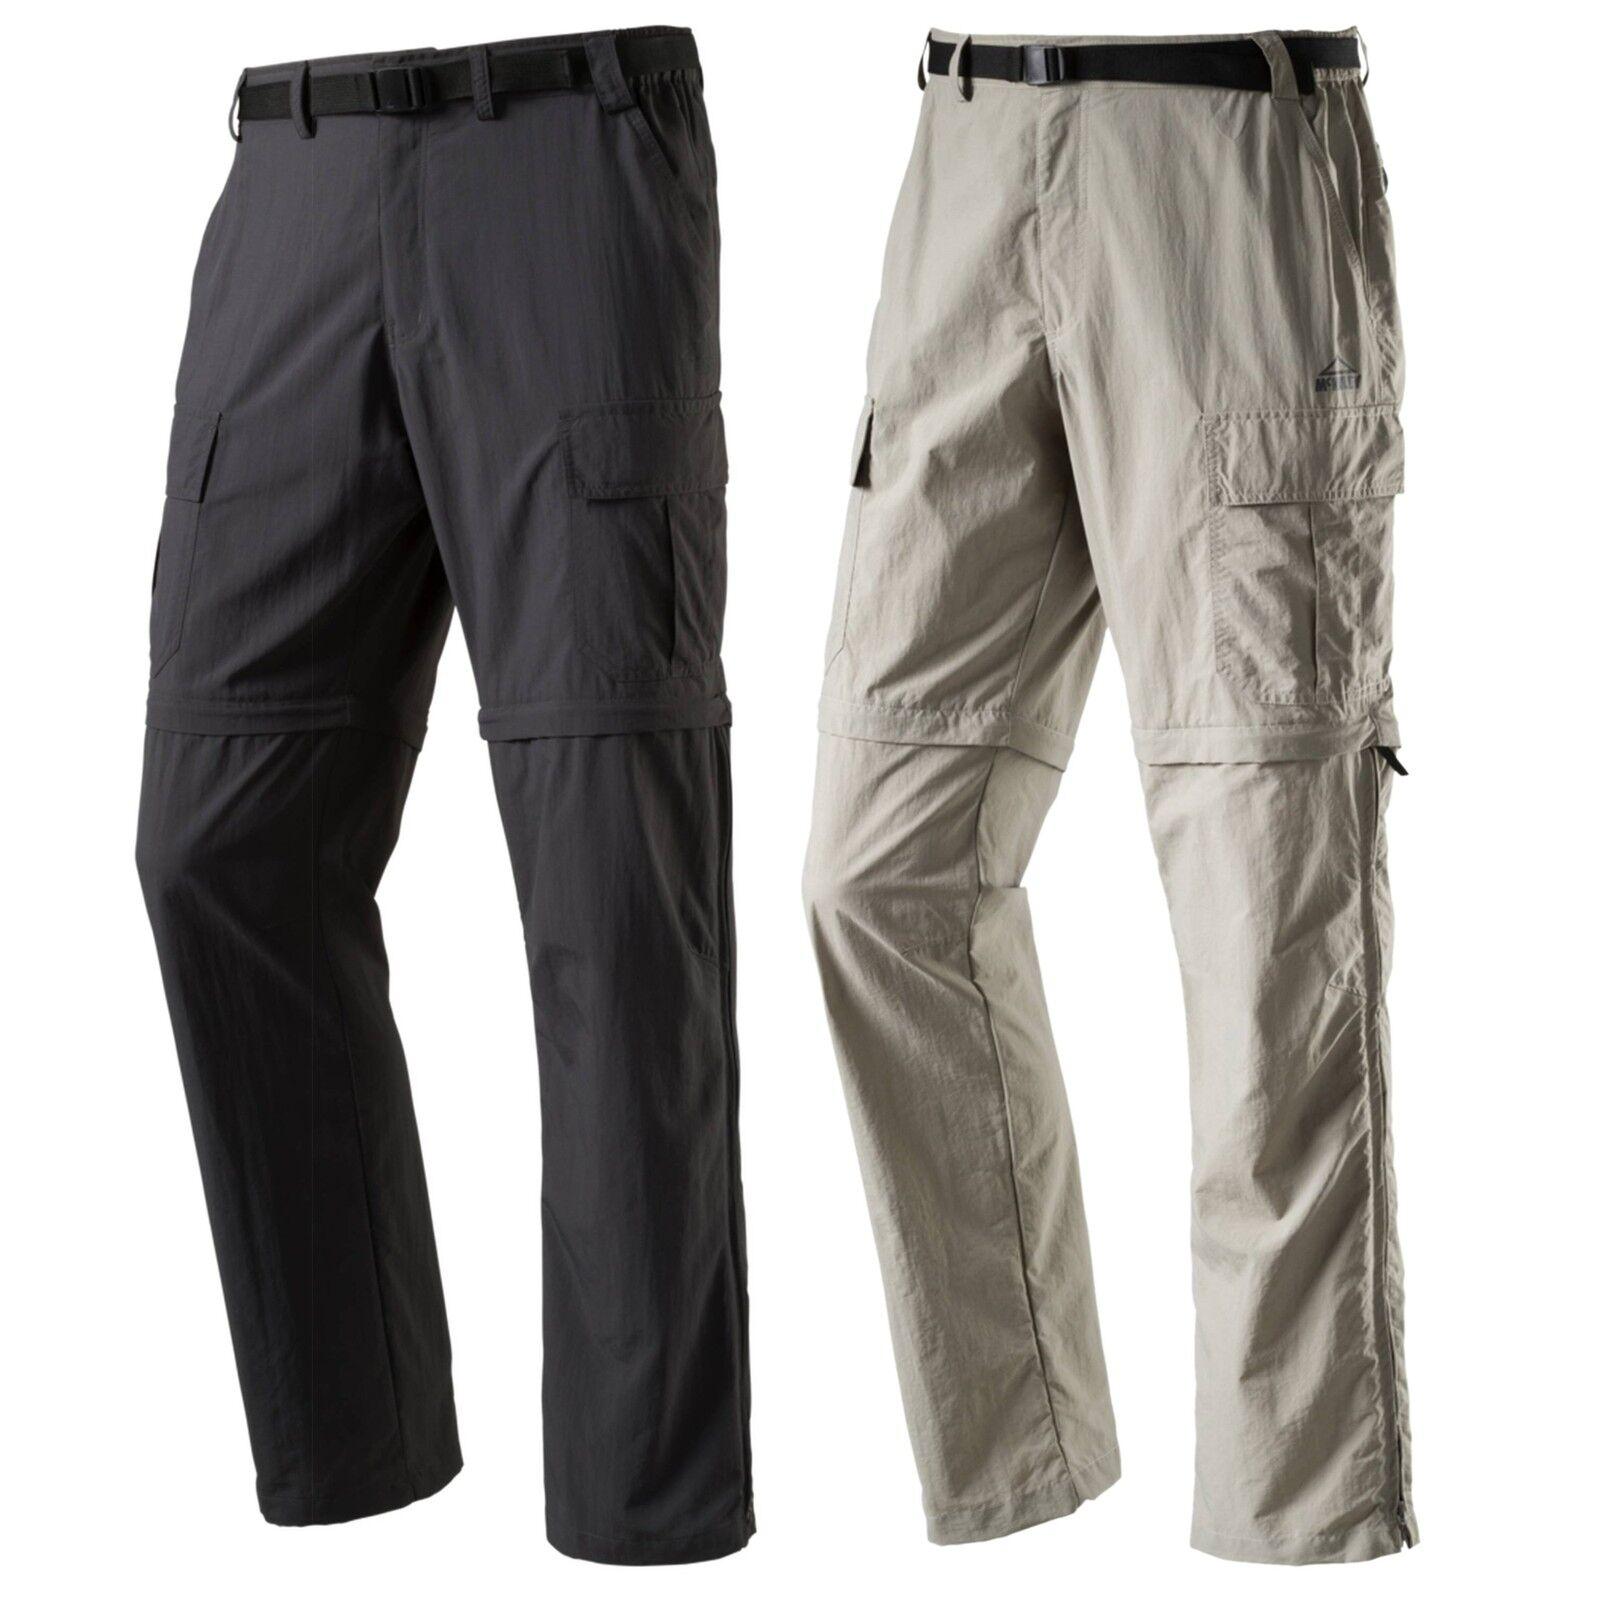 McKinley Herren Hiking Trekking Outdoor Trousers Amite Zip Off Trousers Shorts Dry Plus